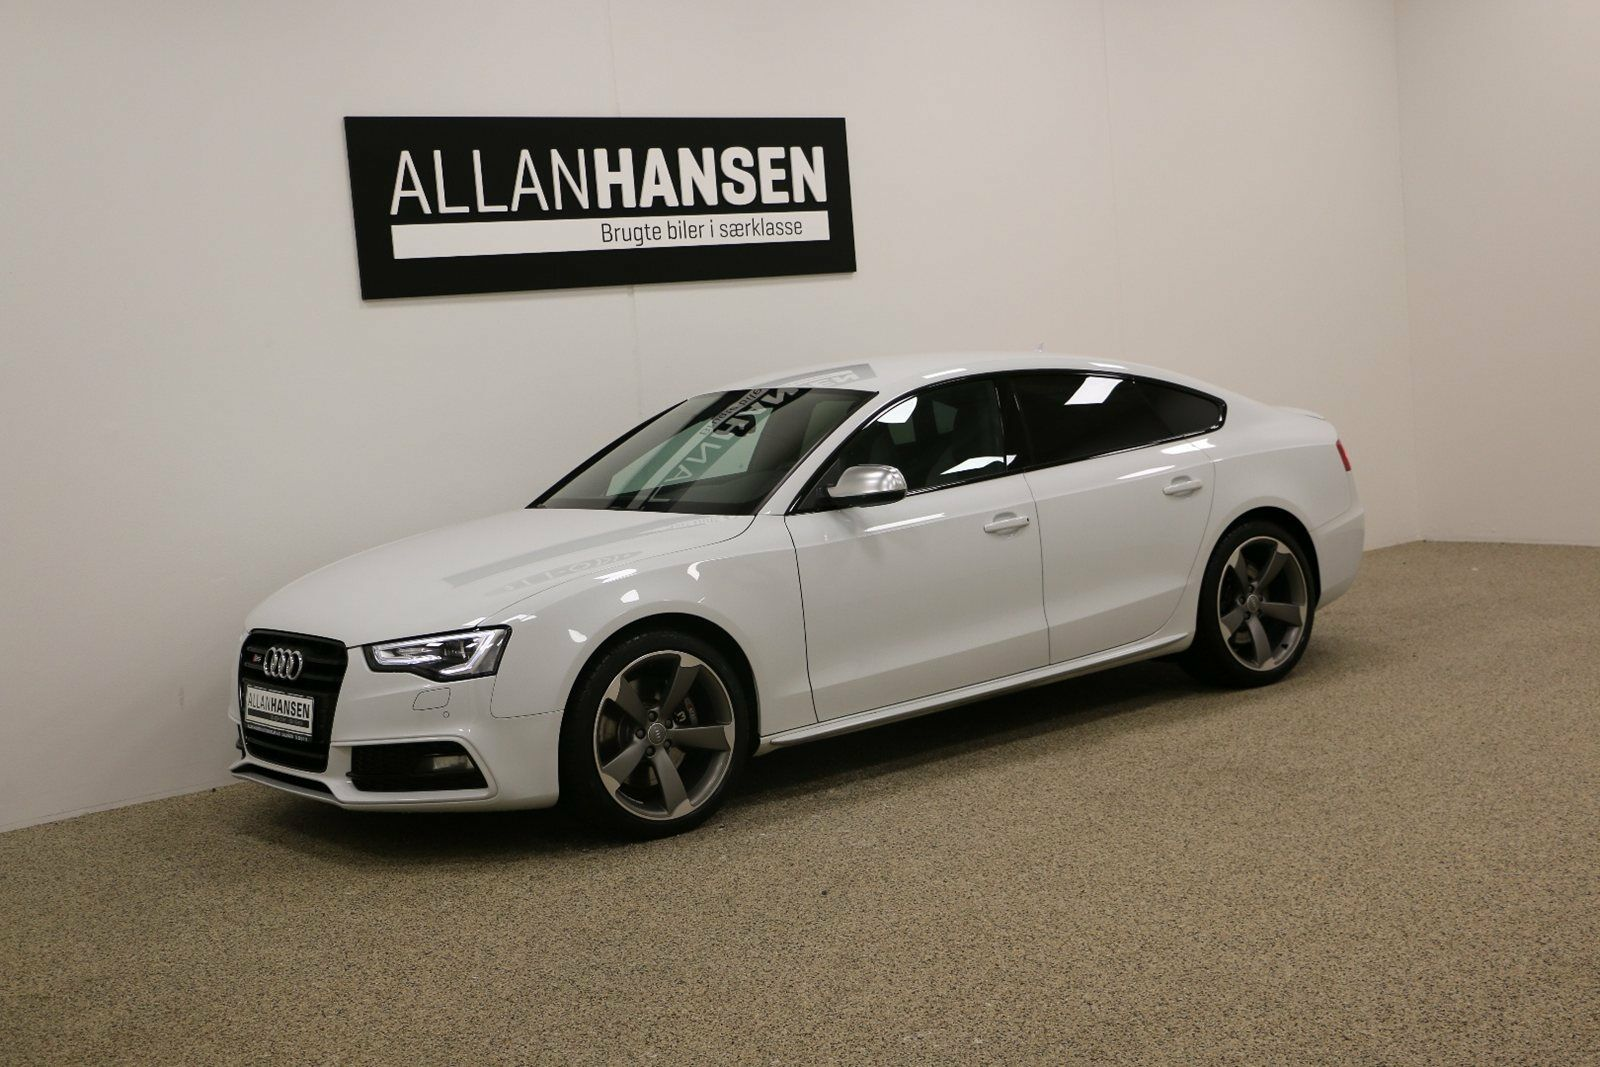 Audi S5 3,0 TFSi SB quattro S-tr. 5d - 599.900 kr.